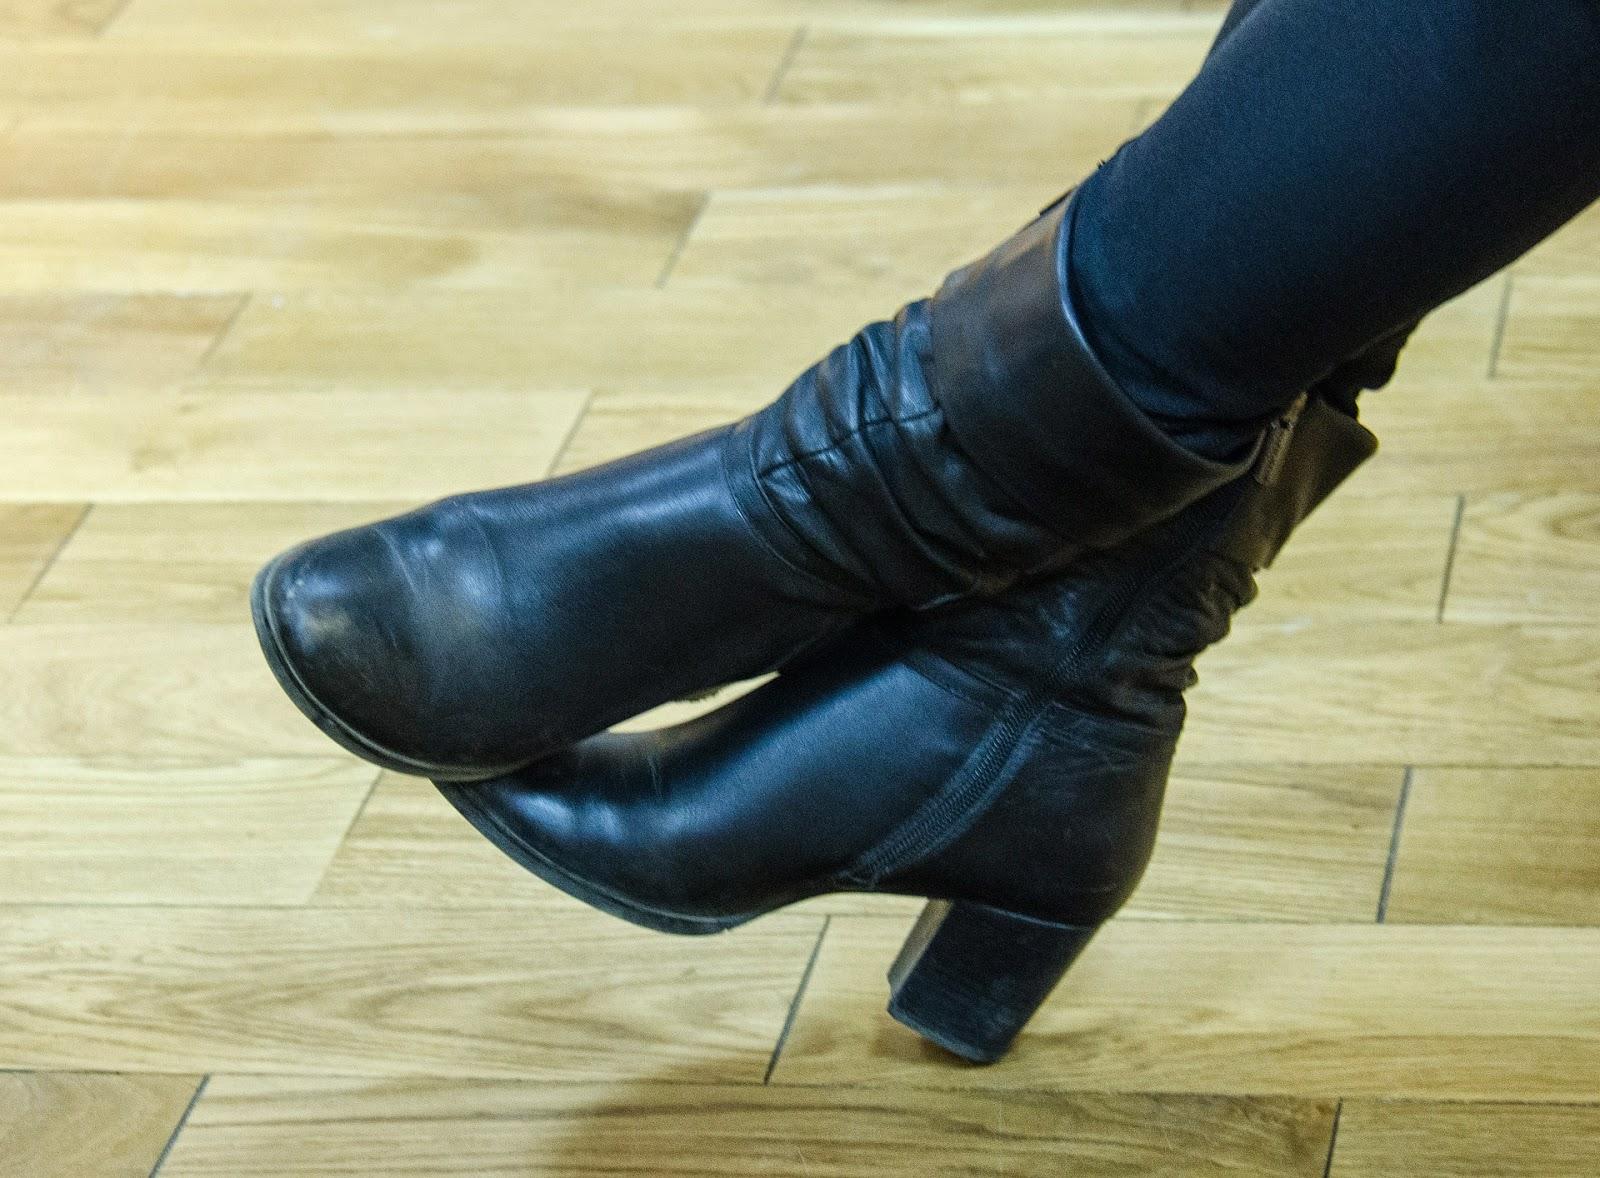 Tip για να βγάλετε τα σημάδια από τακούνια σε πλακάκια και πάτωμα